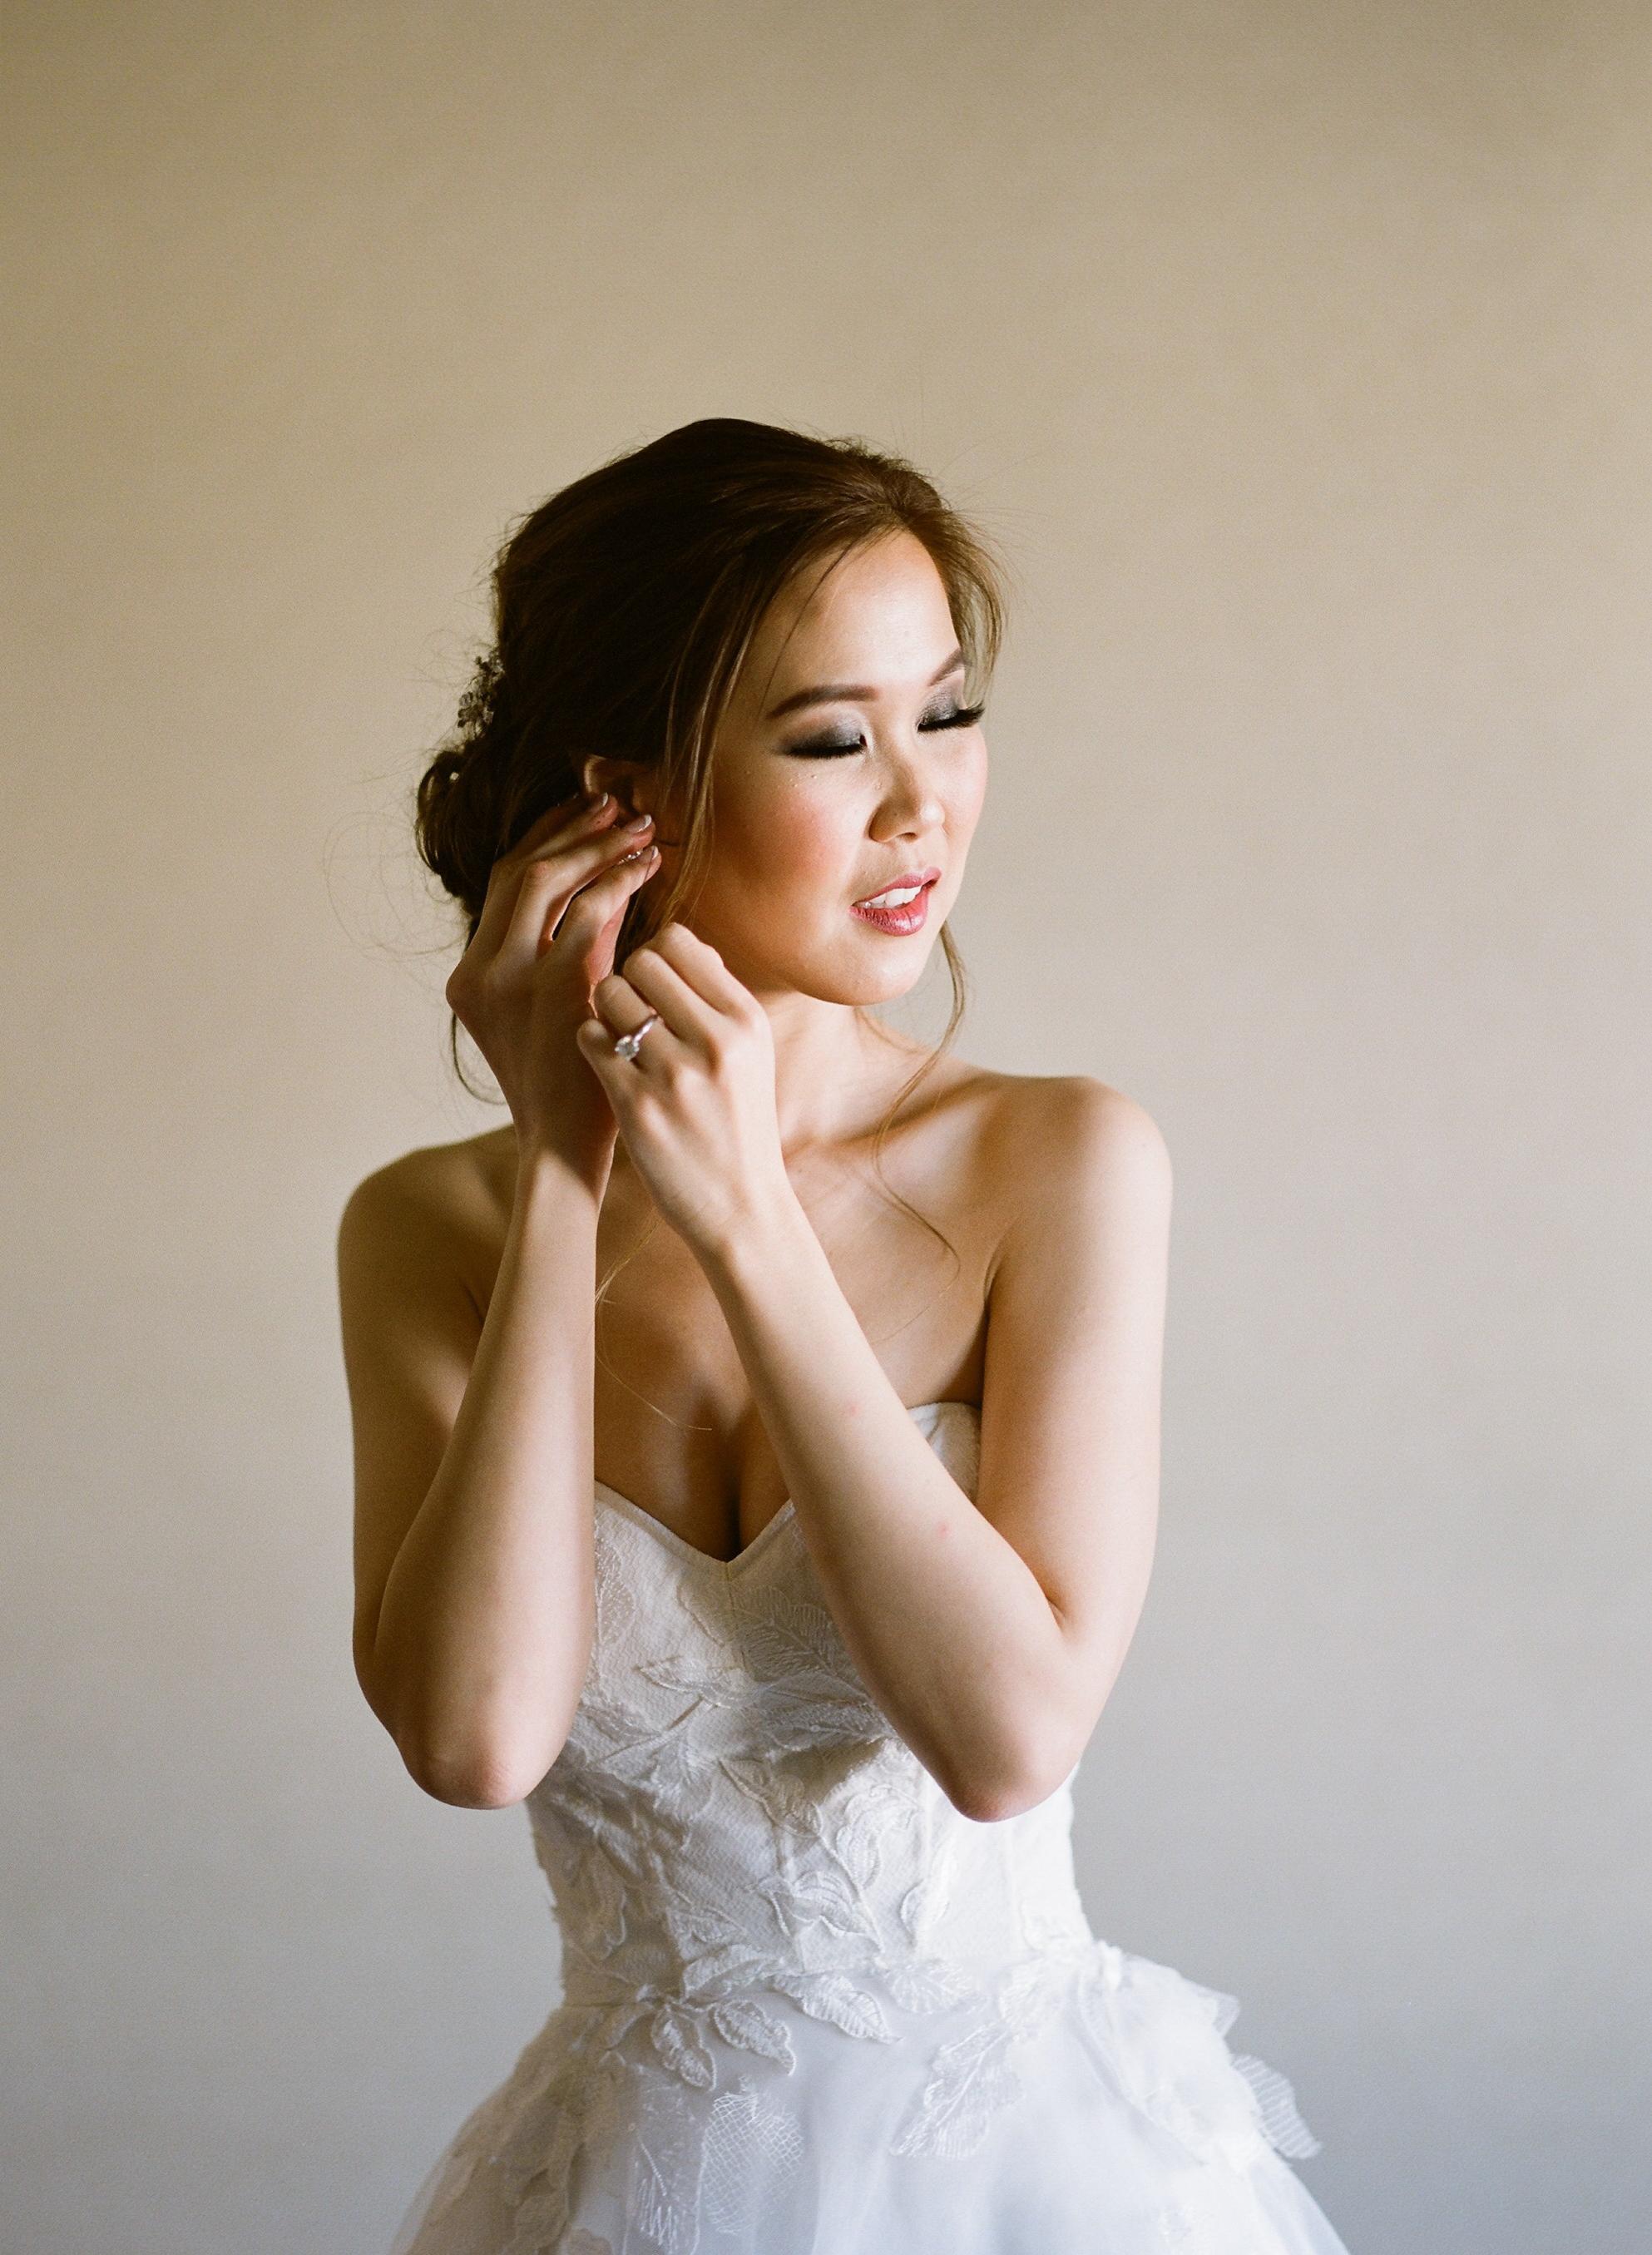 Best Wedding Photographer New York -7.jpg